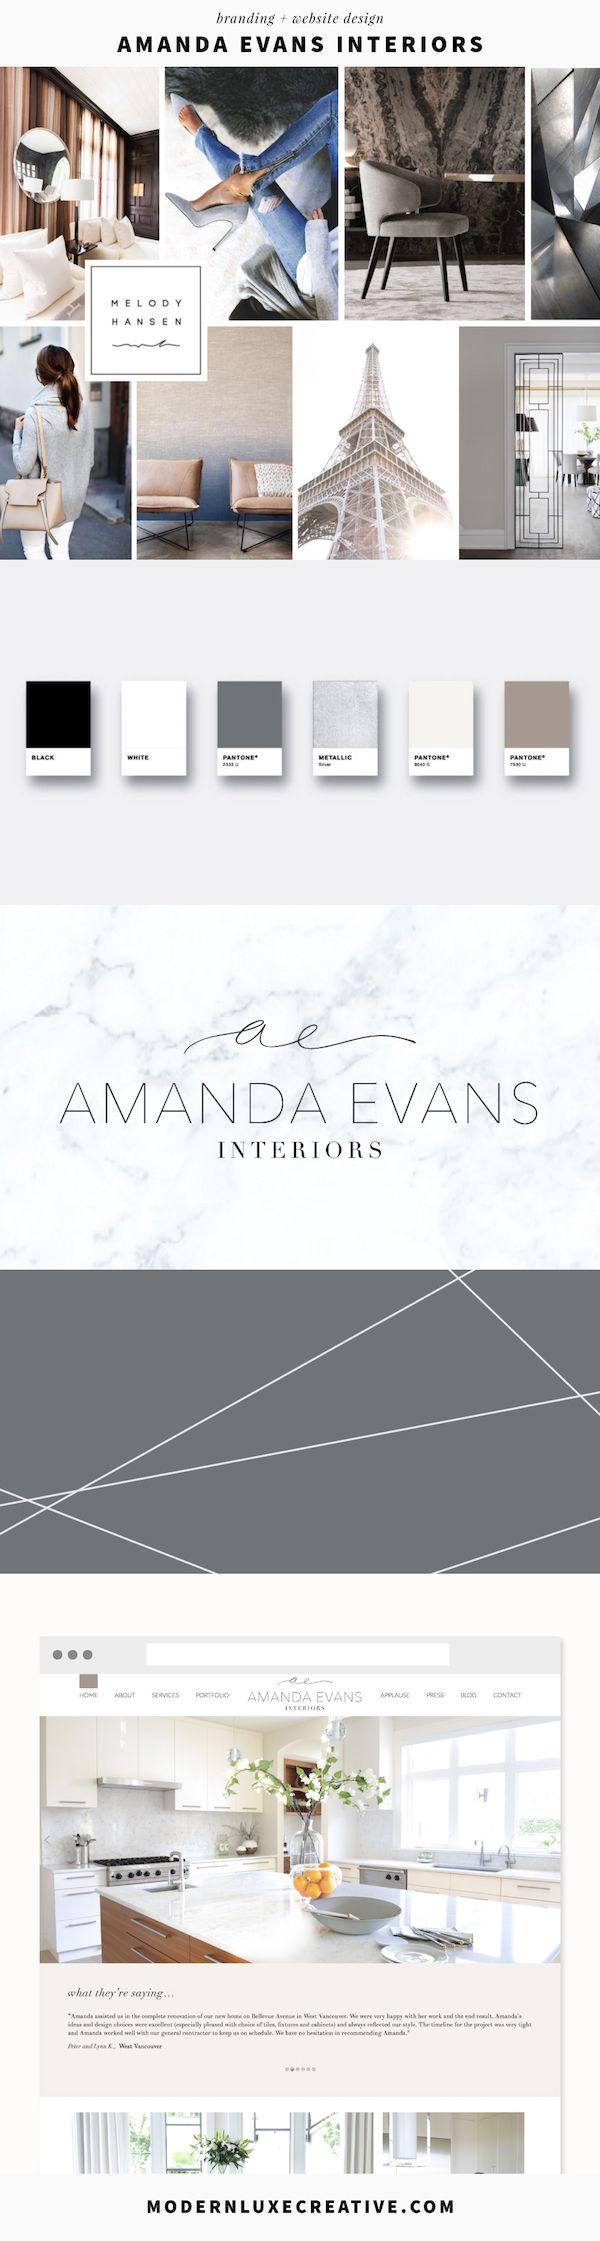 Ampoule laureen luhn design graphique - Branding And Website Design For Interior Designer Amanda Evans Interiors Modern Luxe Creative Is A